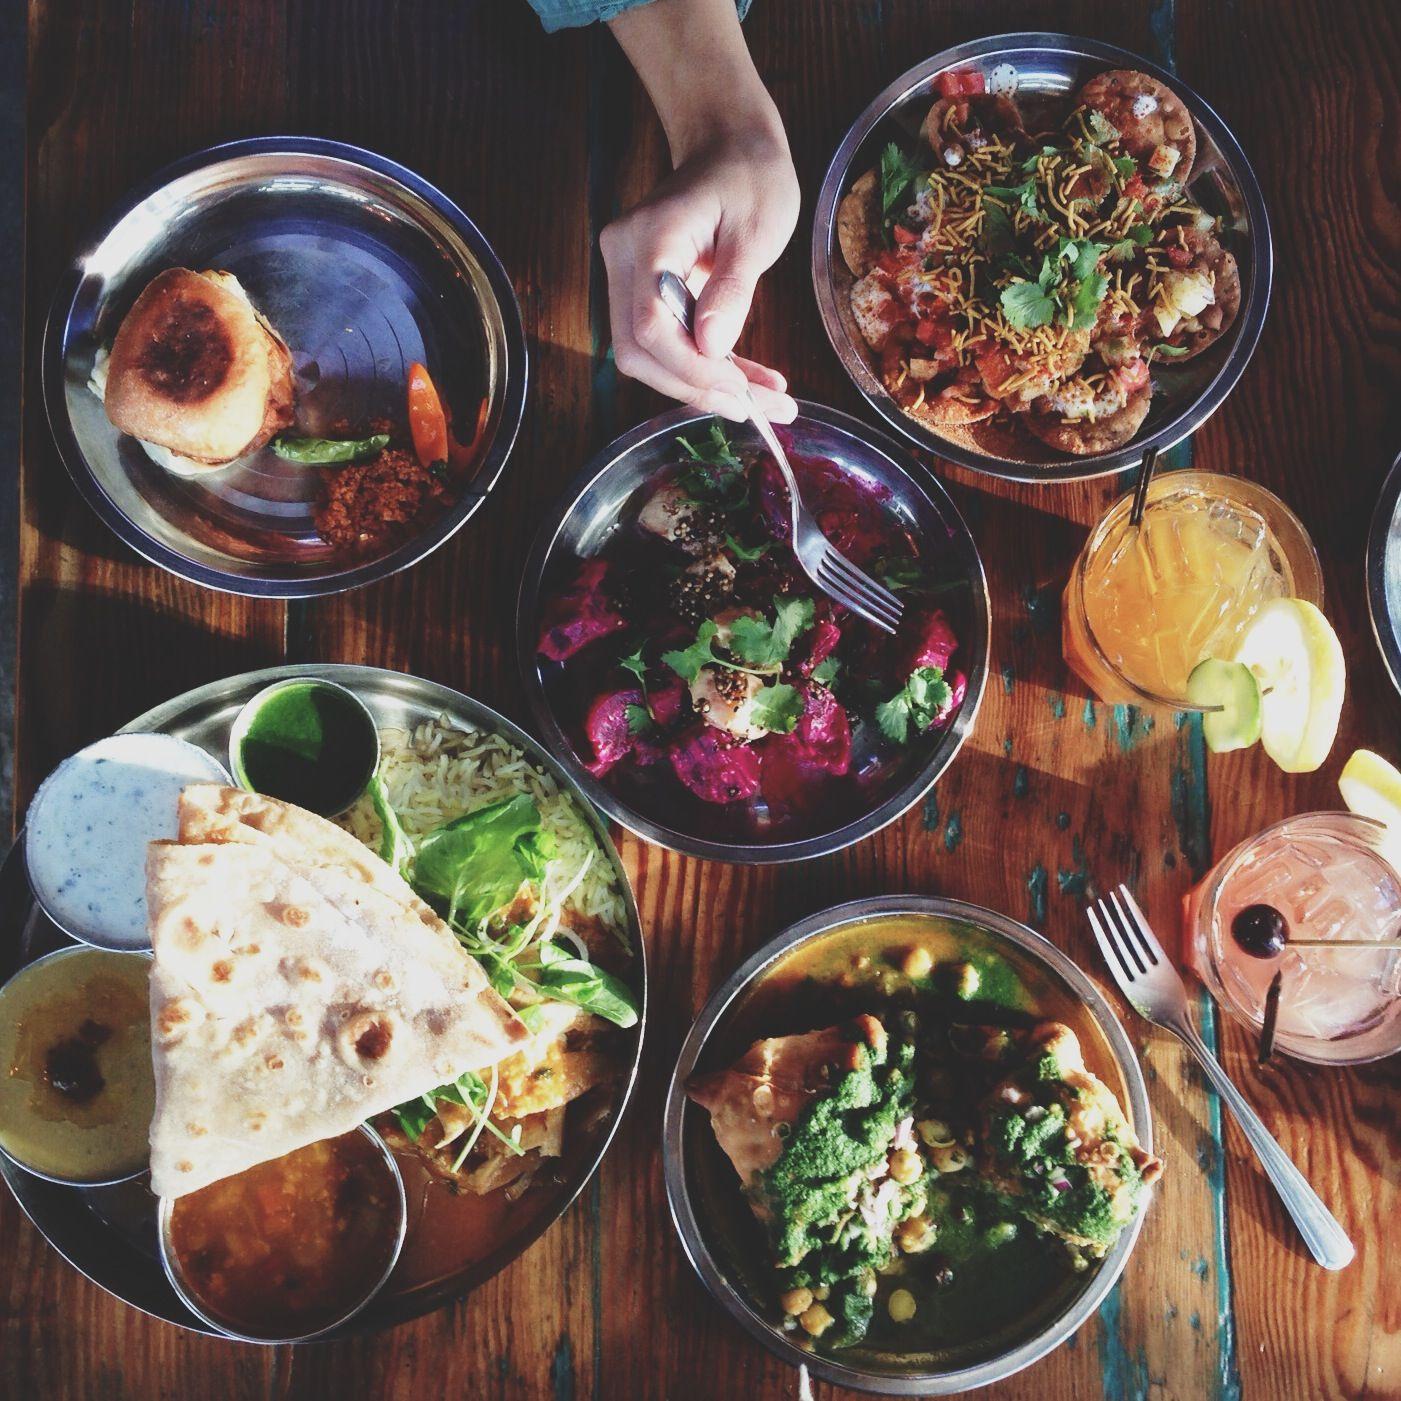 Indian food feast Indian food recipes, Food, Pretty food